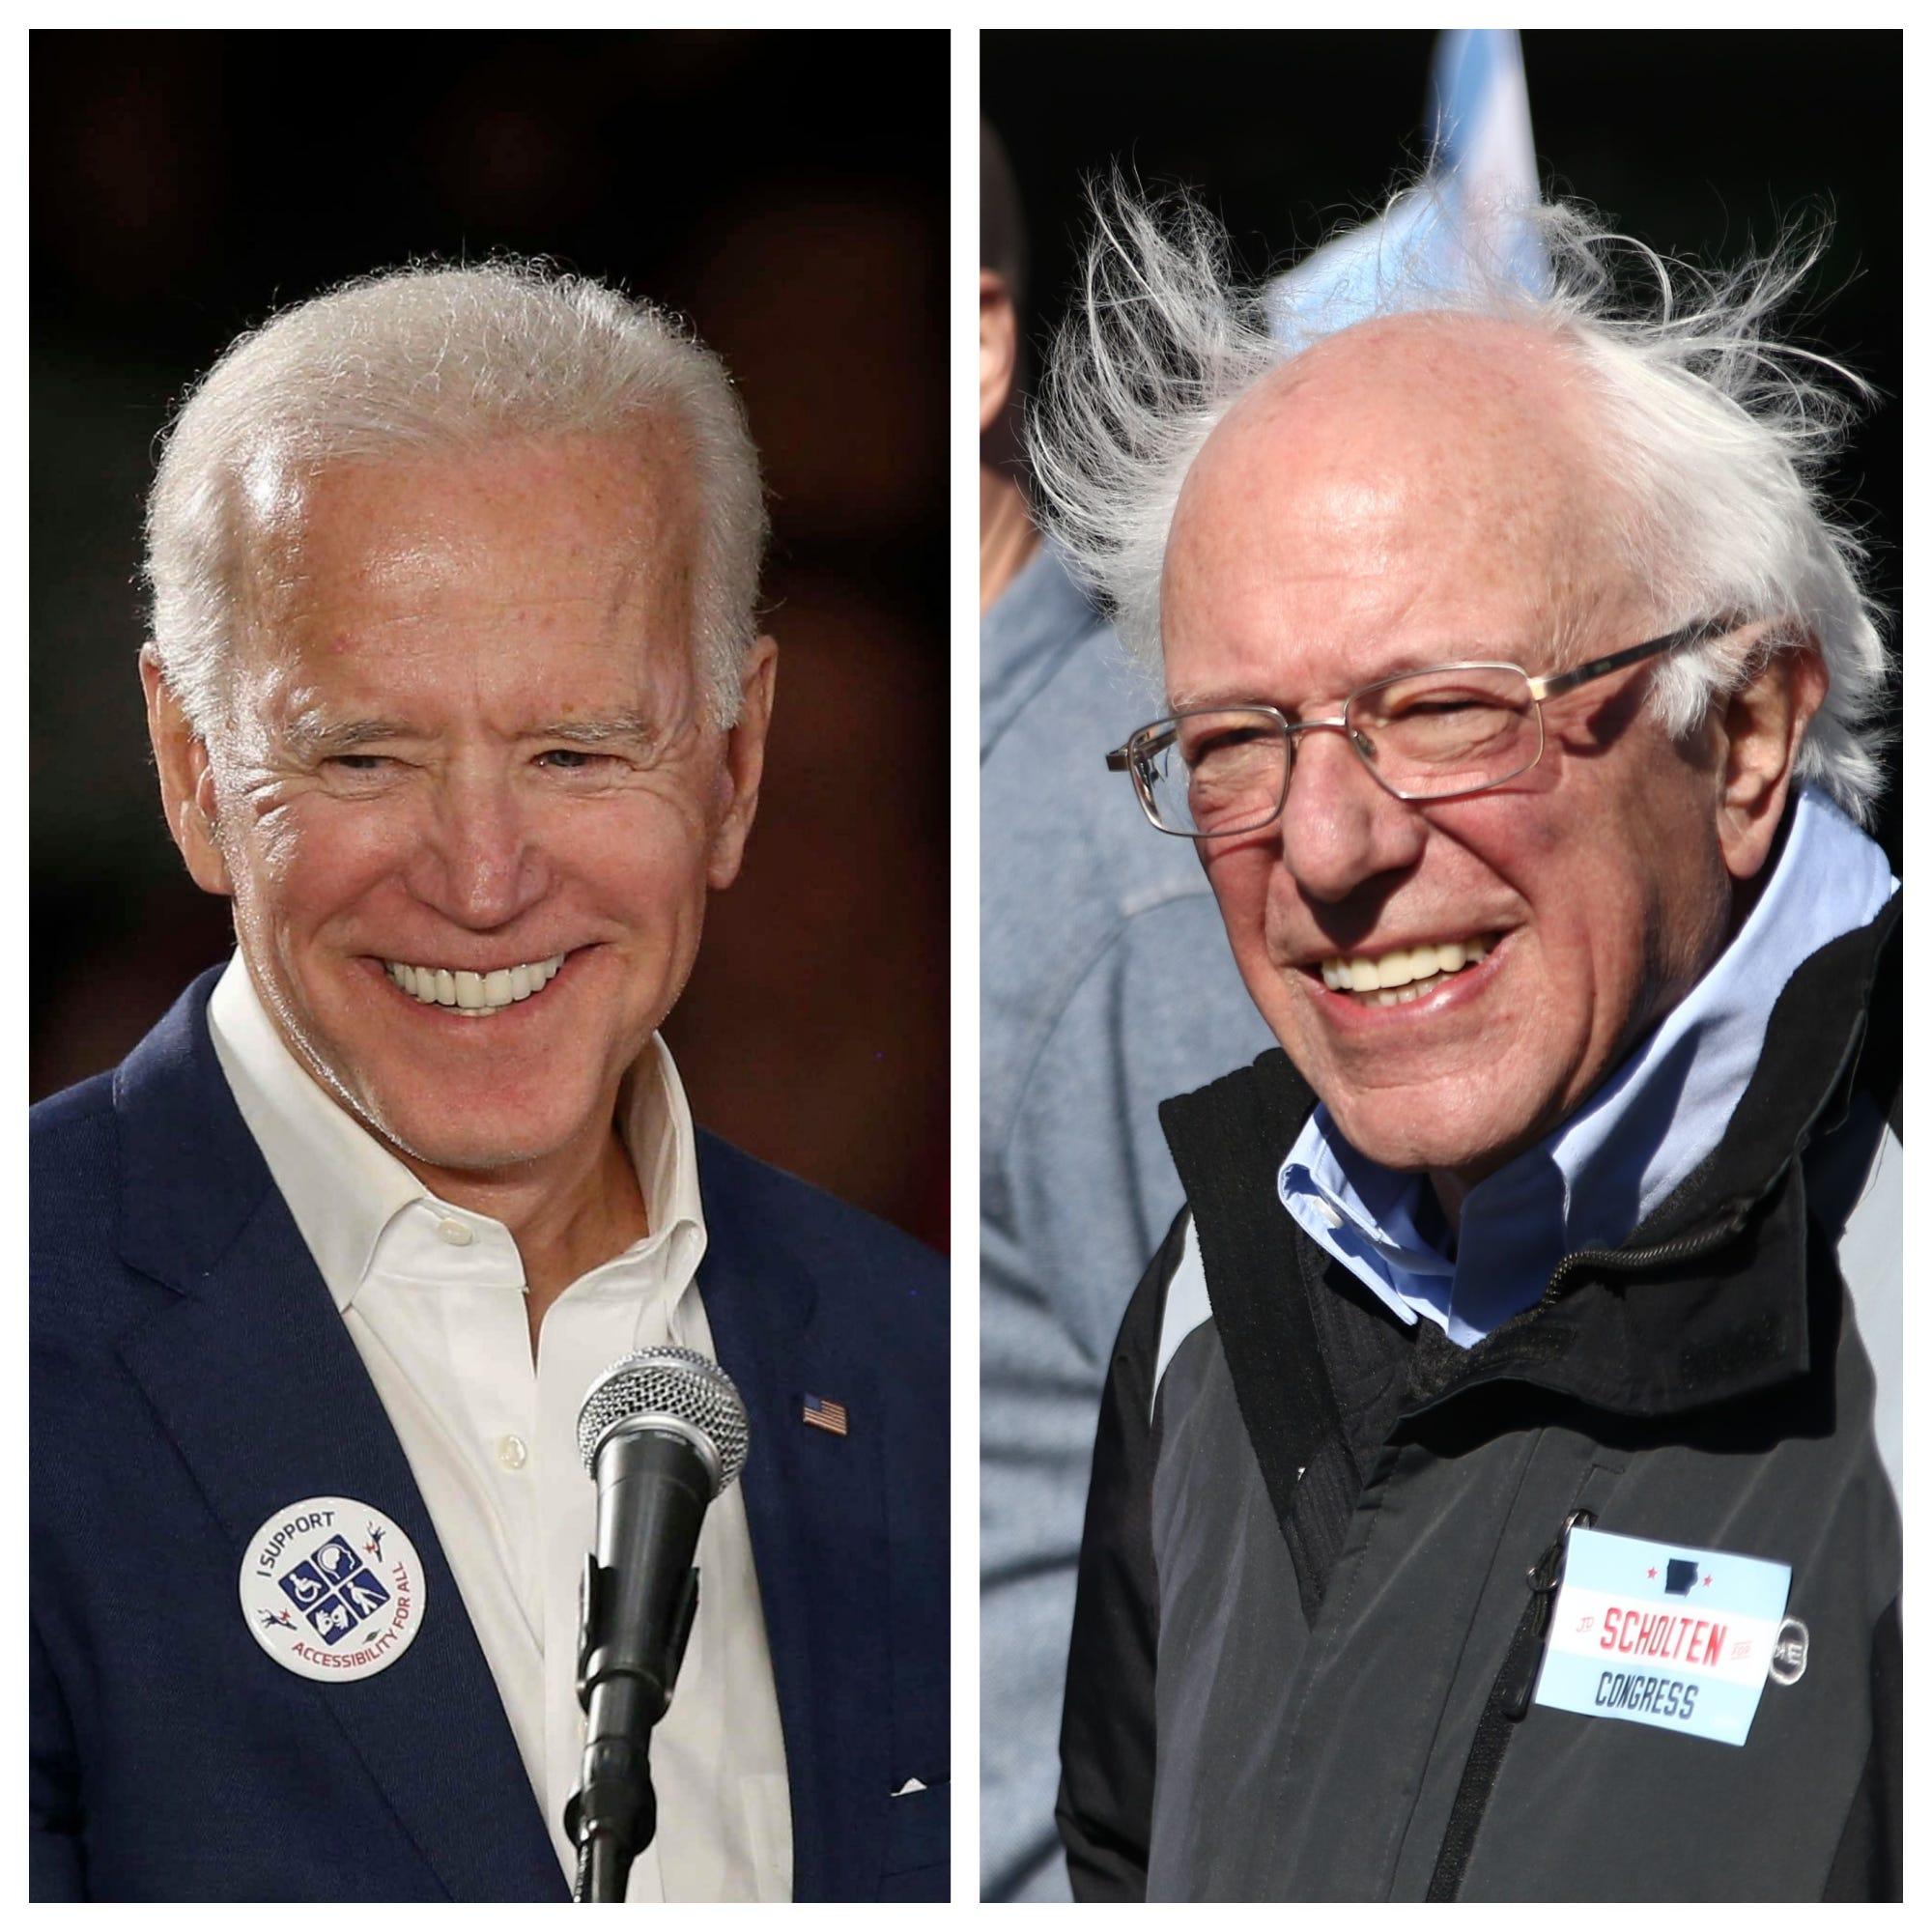 Iowa Poll: Biden, Sanders top early look at possible Democratic hopefuls in 2020 caucuses